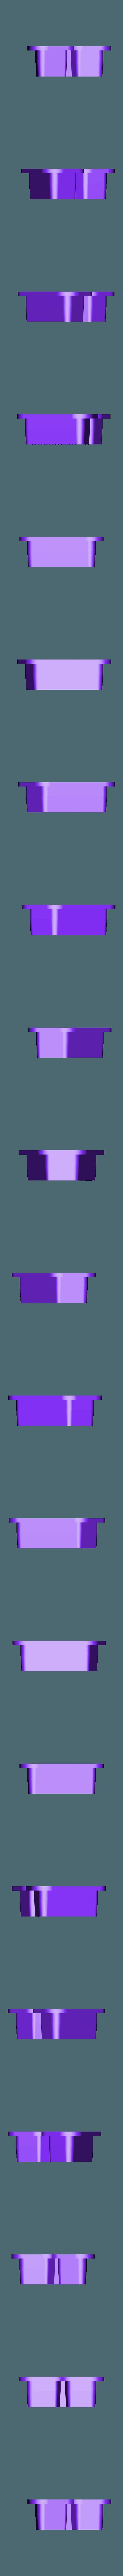 JAUNE grand A.STL Download STL file Patrol Punch (Paw Patrol) • 3D print object, Chris-tropherIlParait